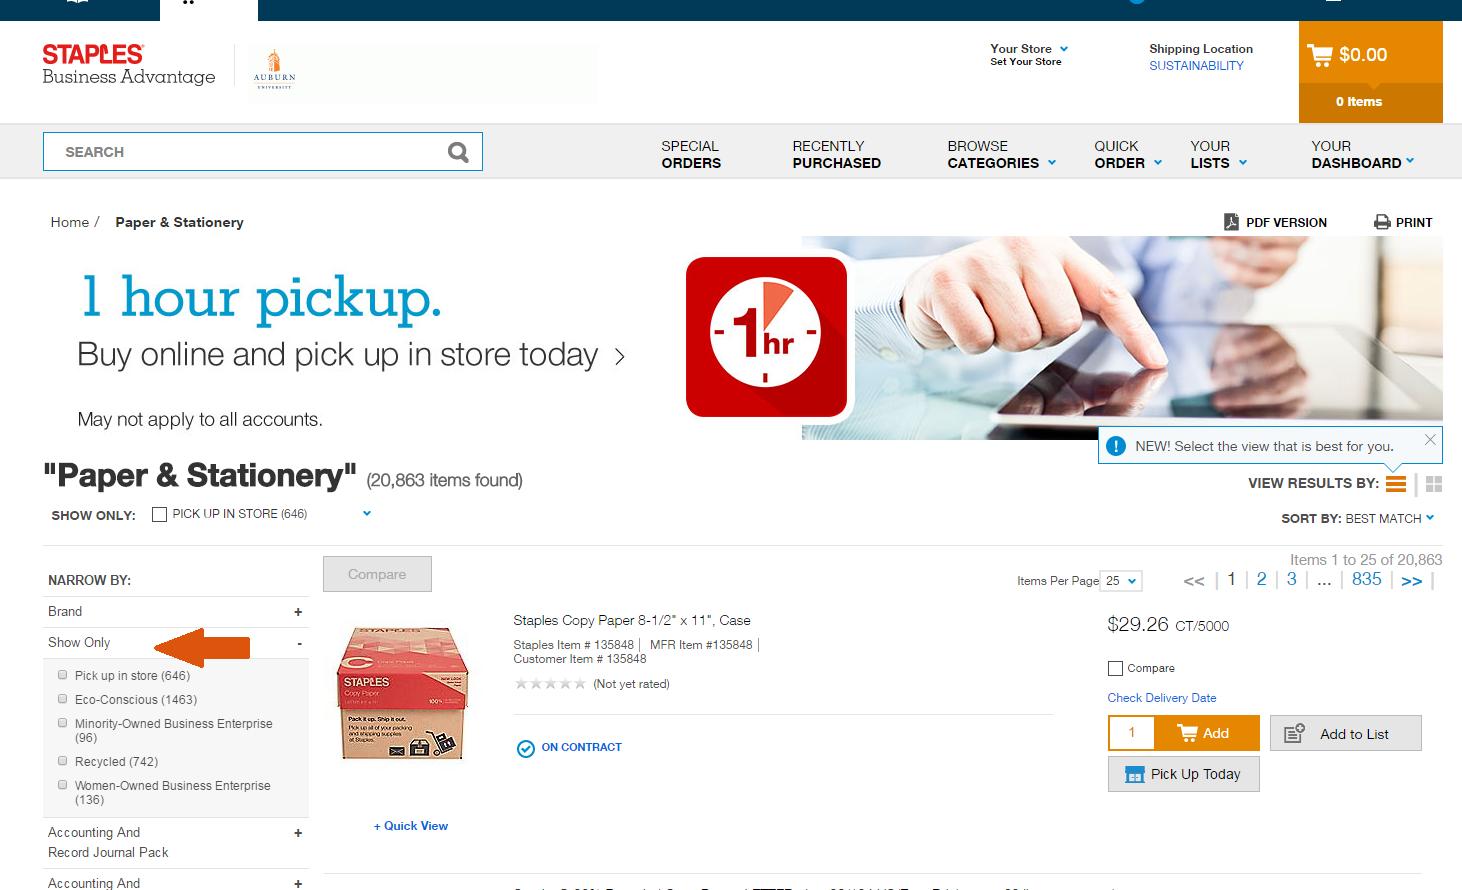 Screenshot of Staples Advantage website showing filtering options on sidebar.